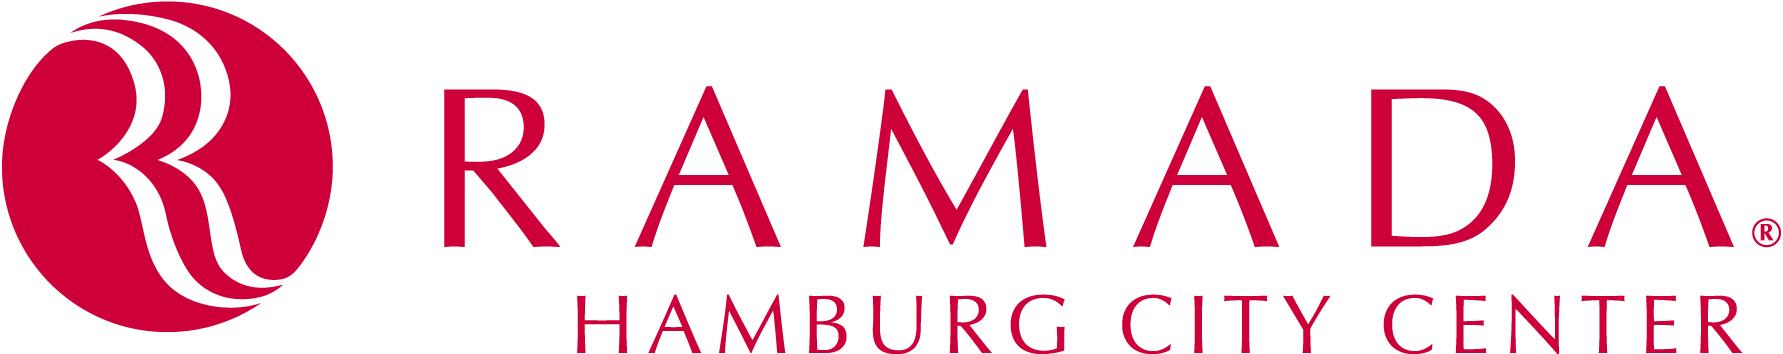 logo_ramada_hamburg_citycenter